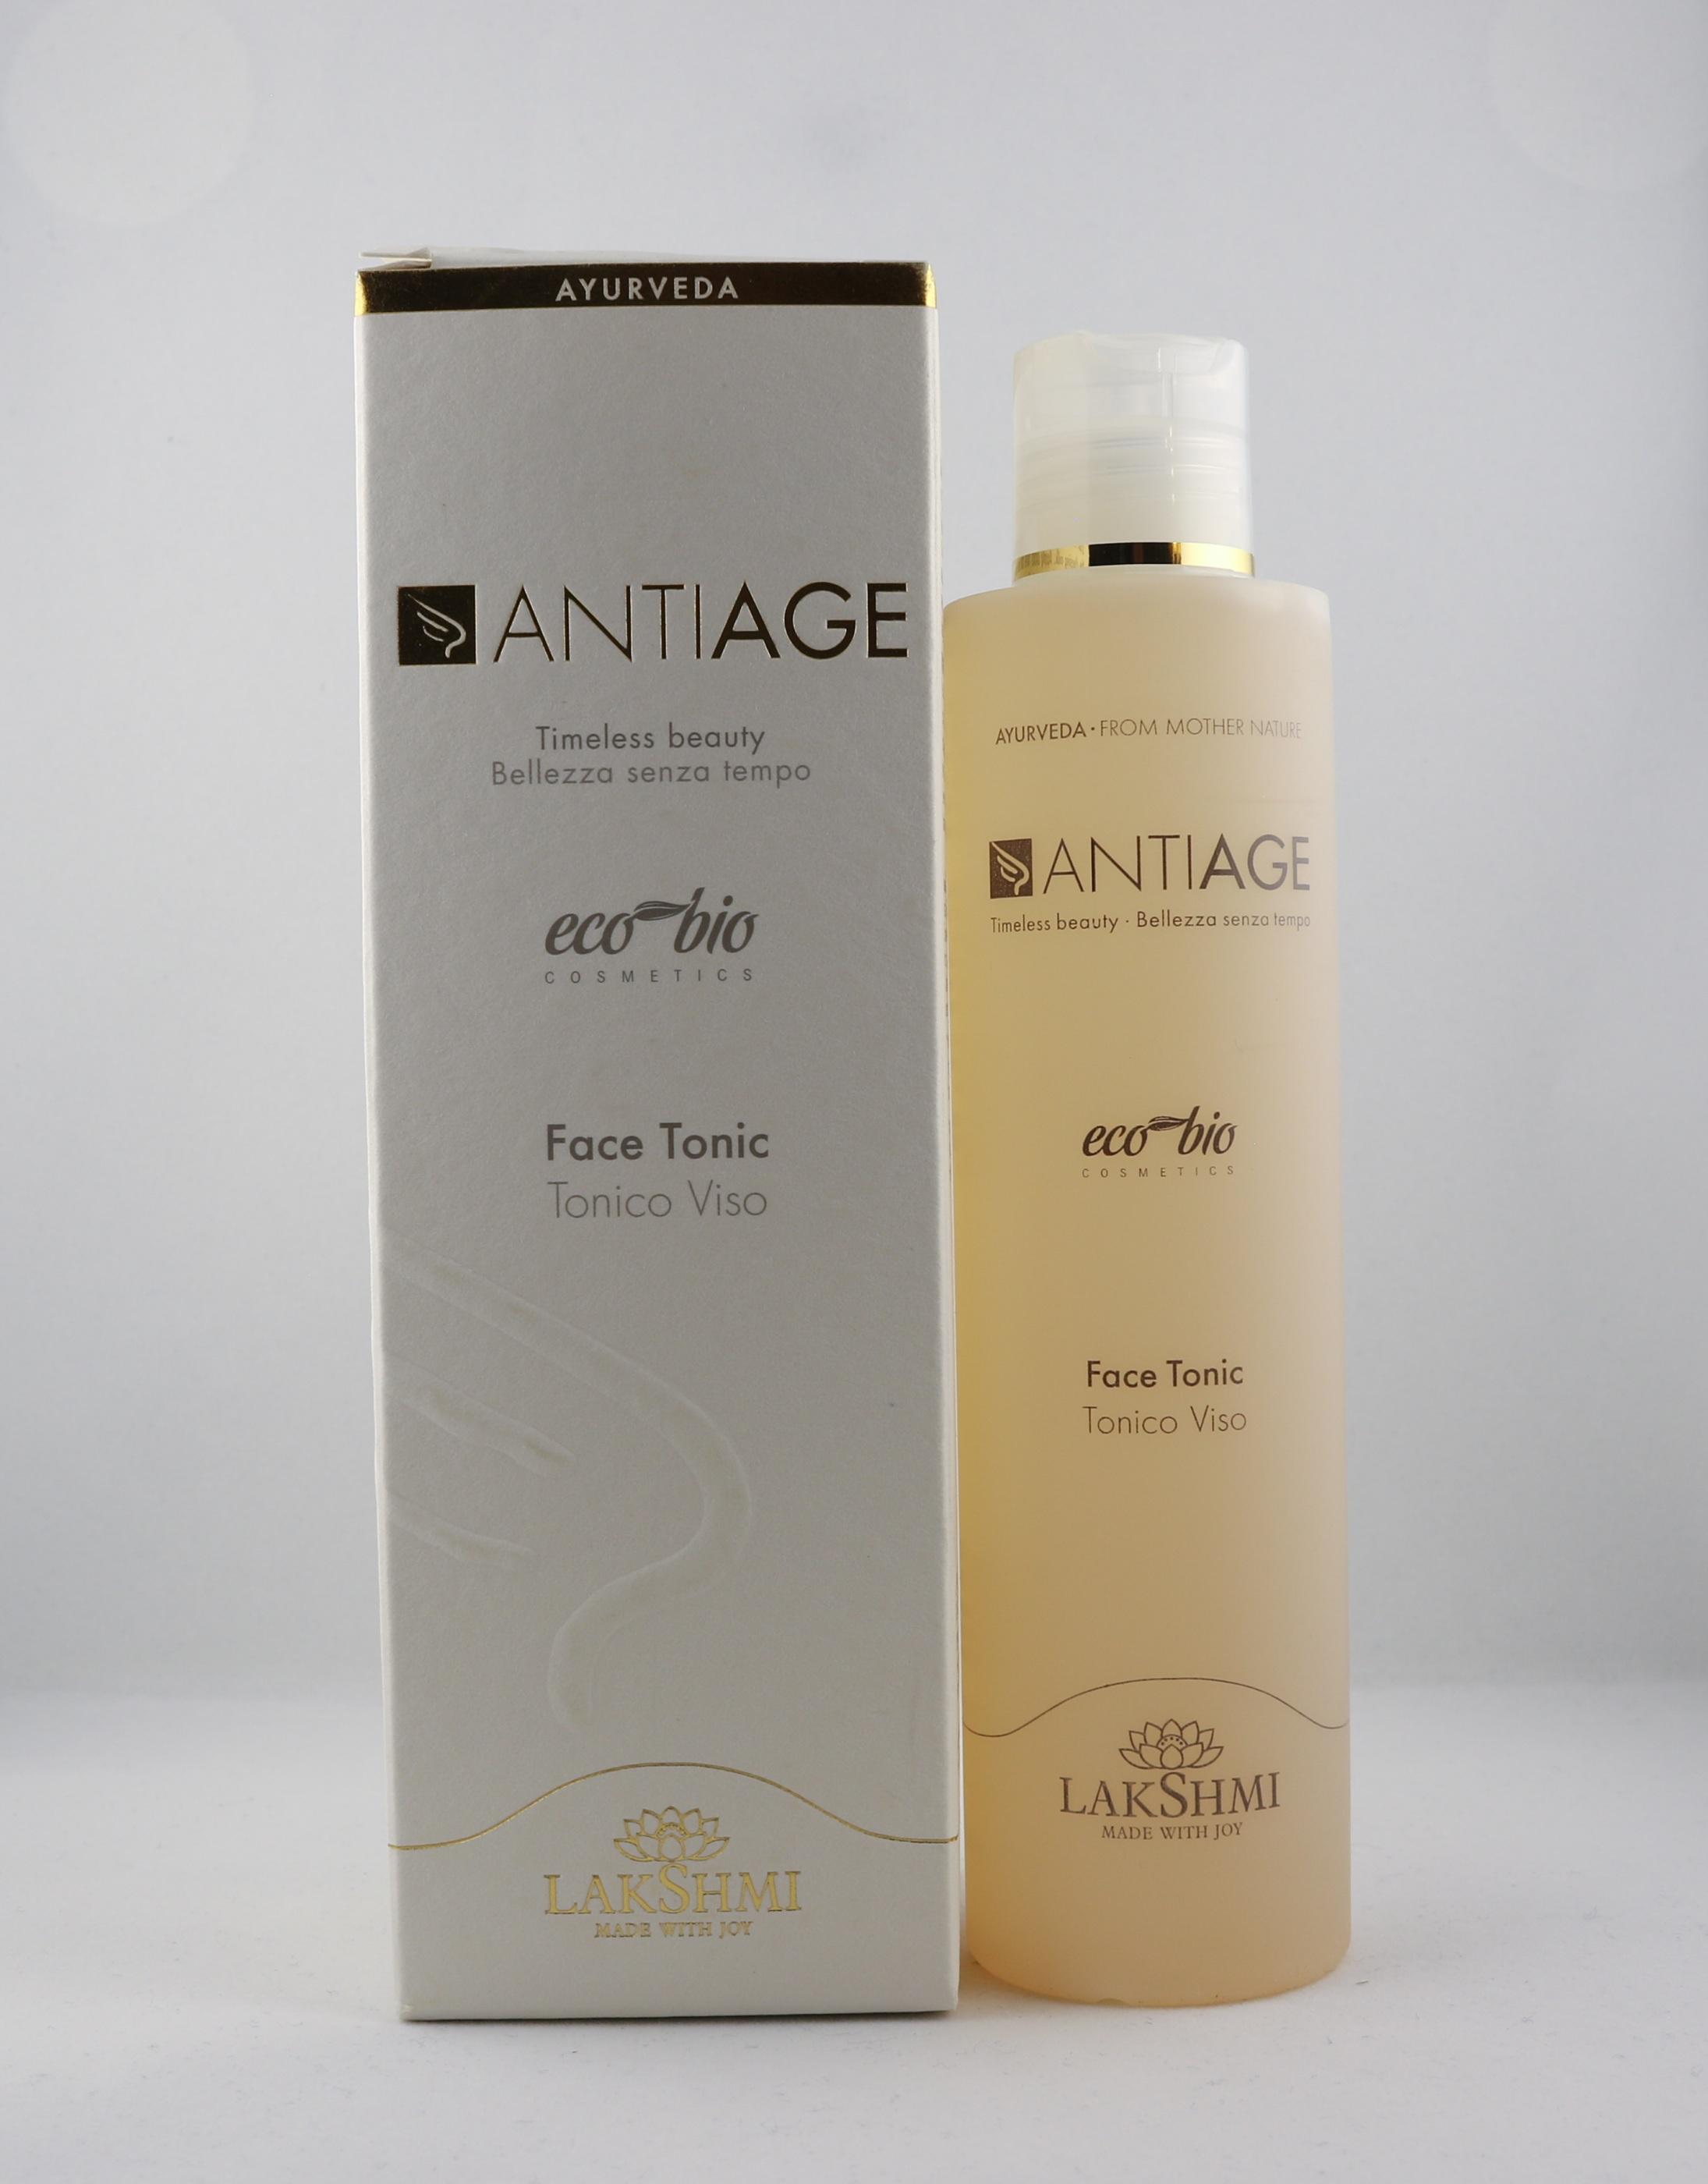 Anti-Age Face Tonic hudvårdsprodukt hudvårdstyp alternativ hälsa wellness ayurveda anti age